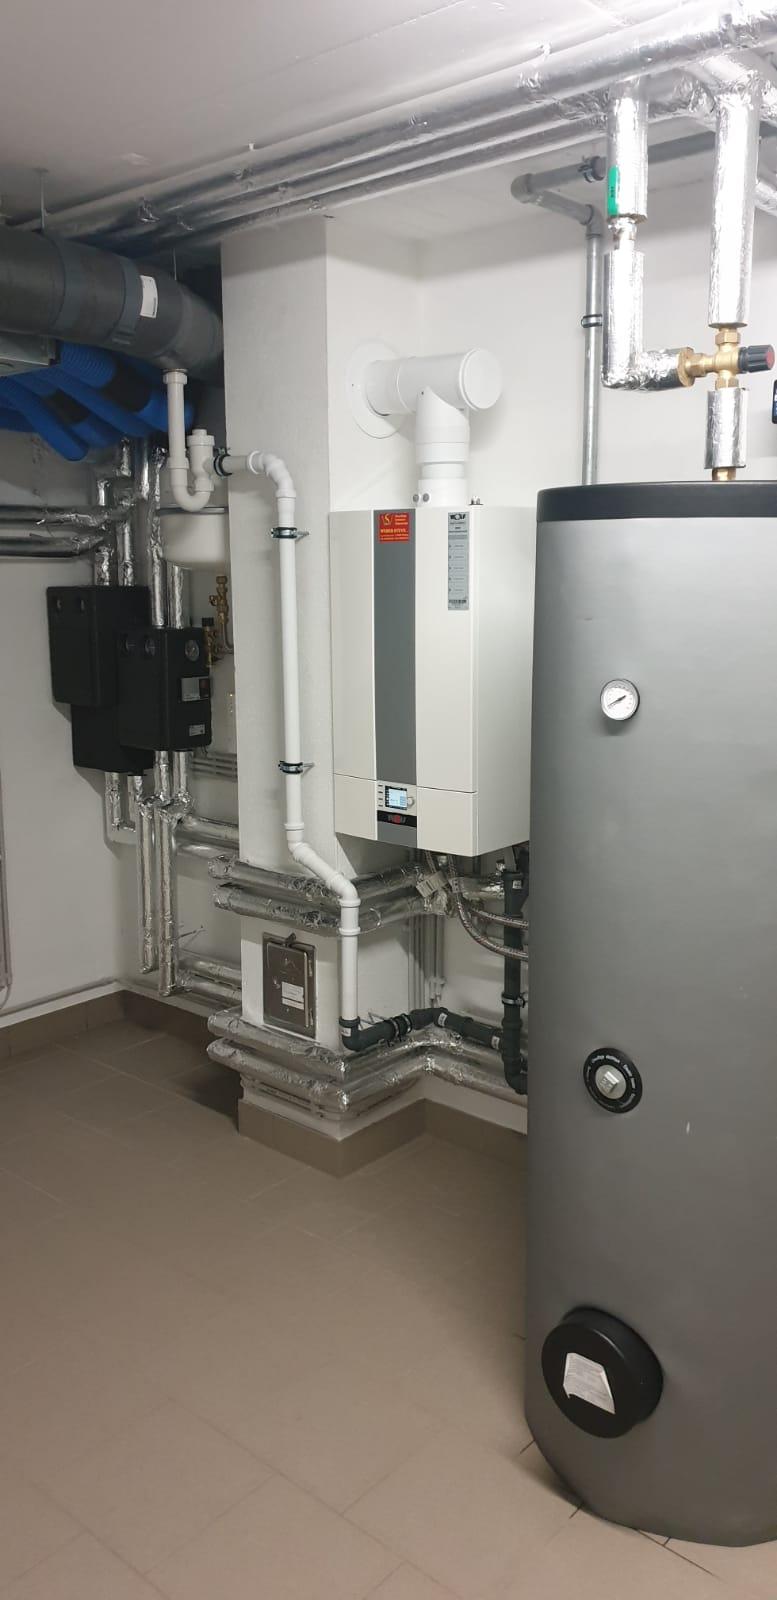 Installation Chaudière À Condensation weber steve plus sàrl | installation de chauffage